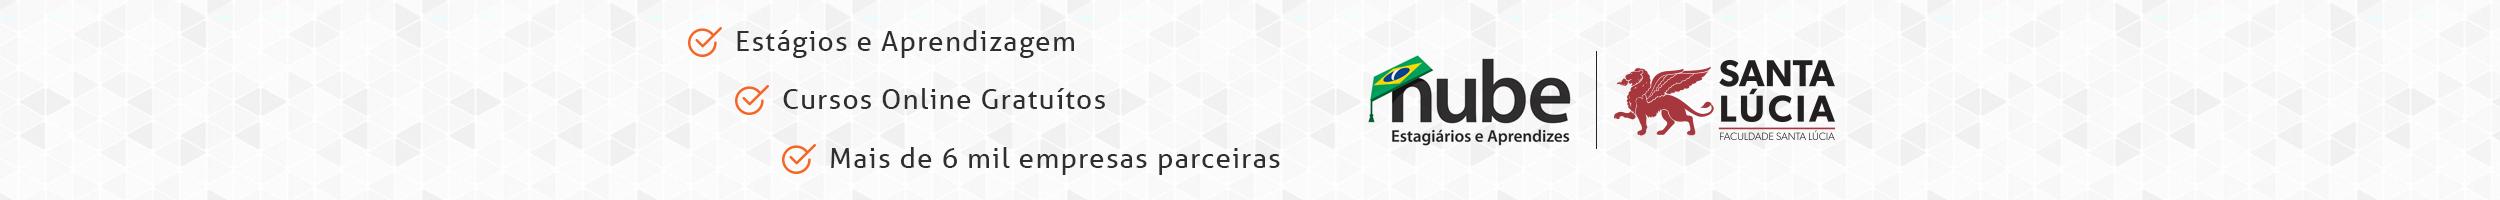 banner_nube_santa_lucia